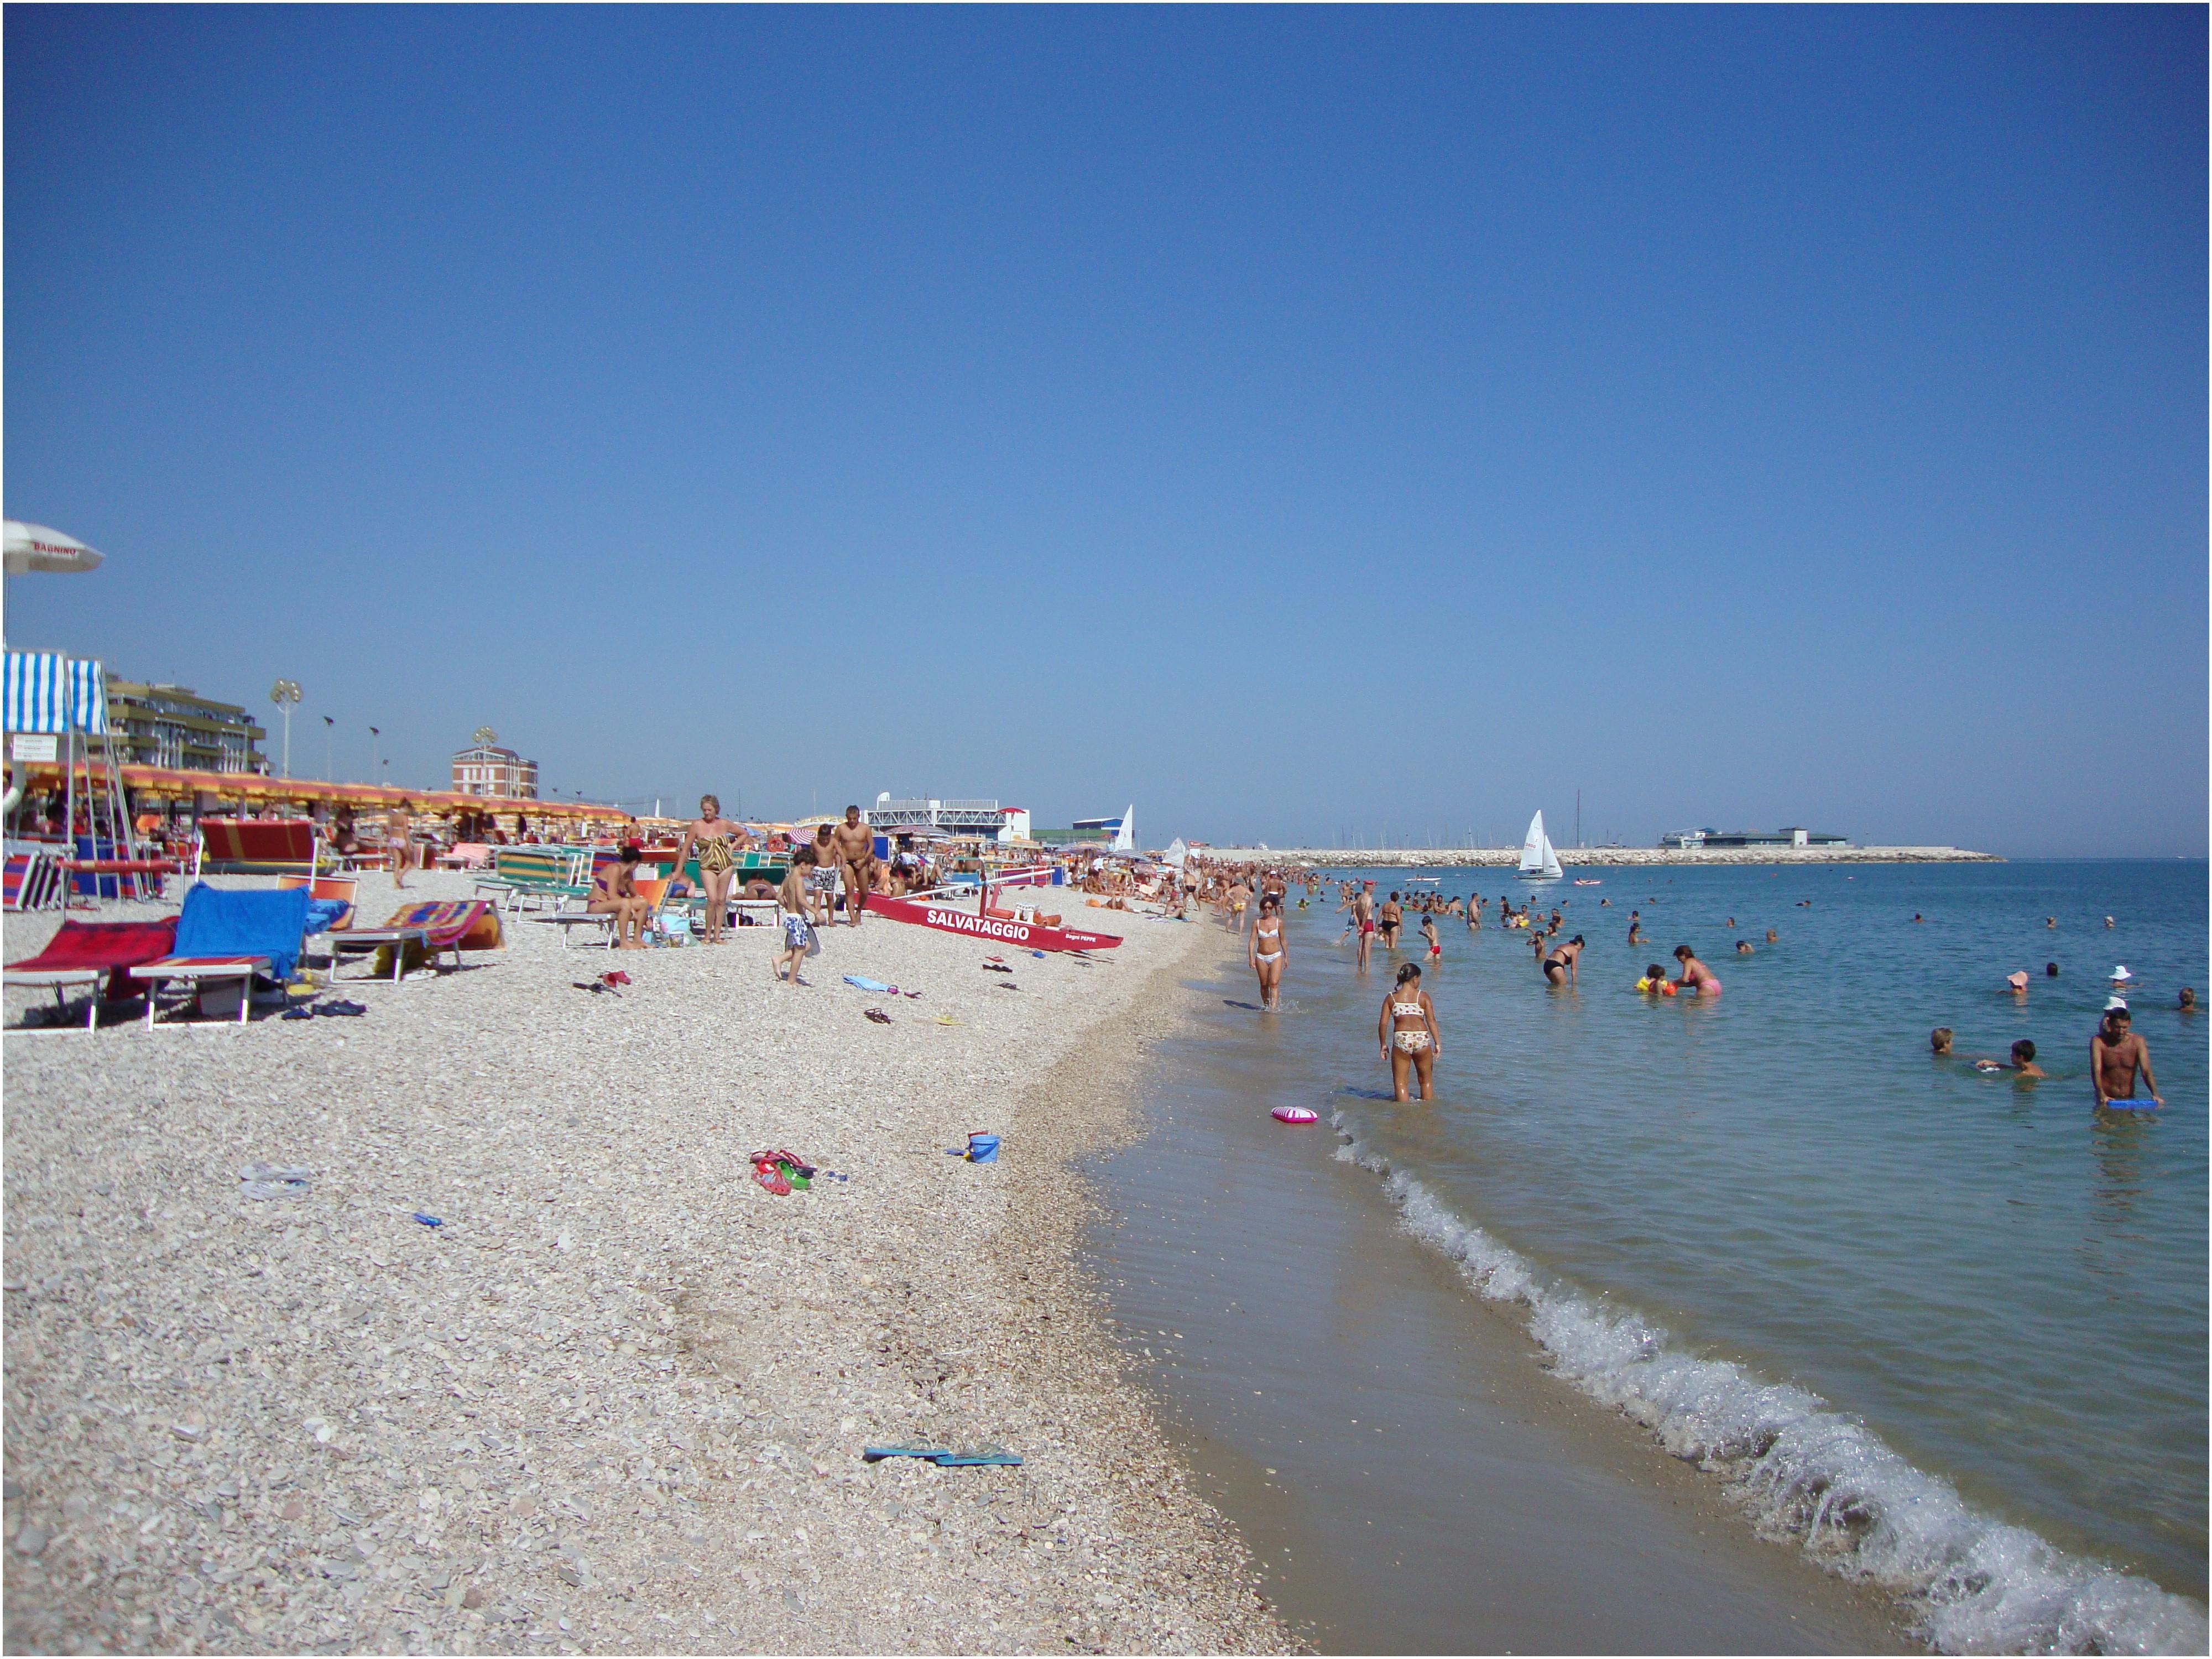 Fano Beach Wikimedia mons